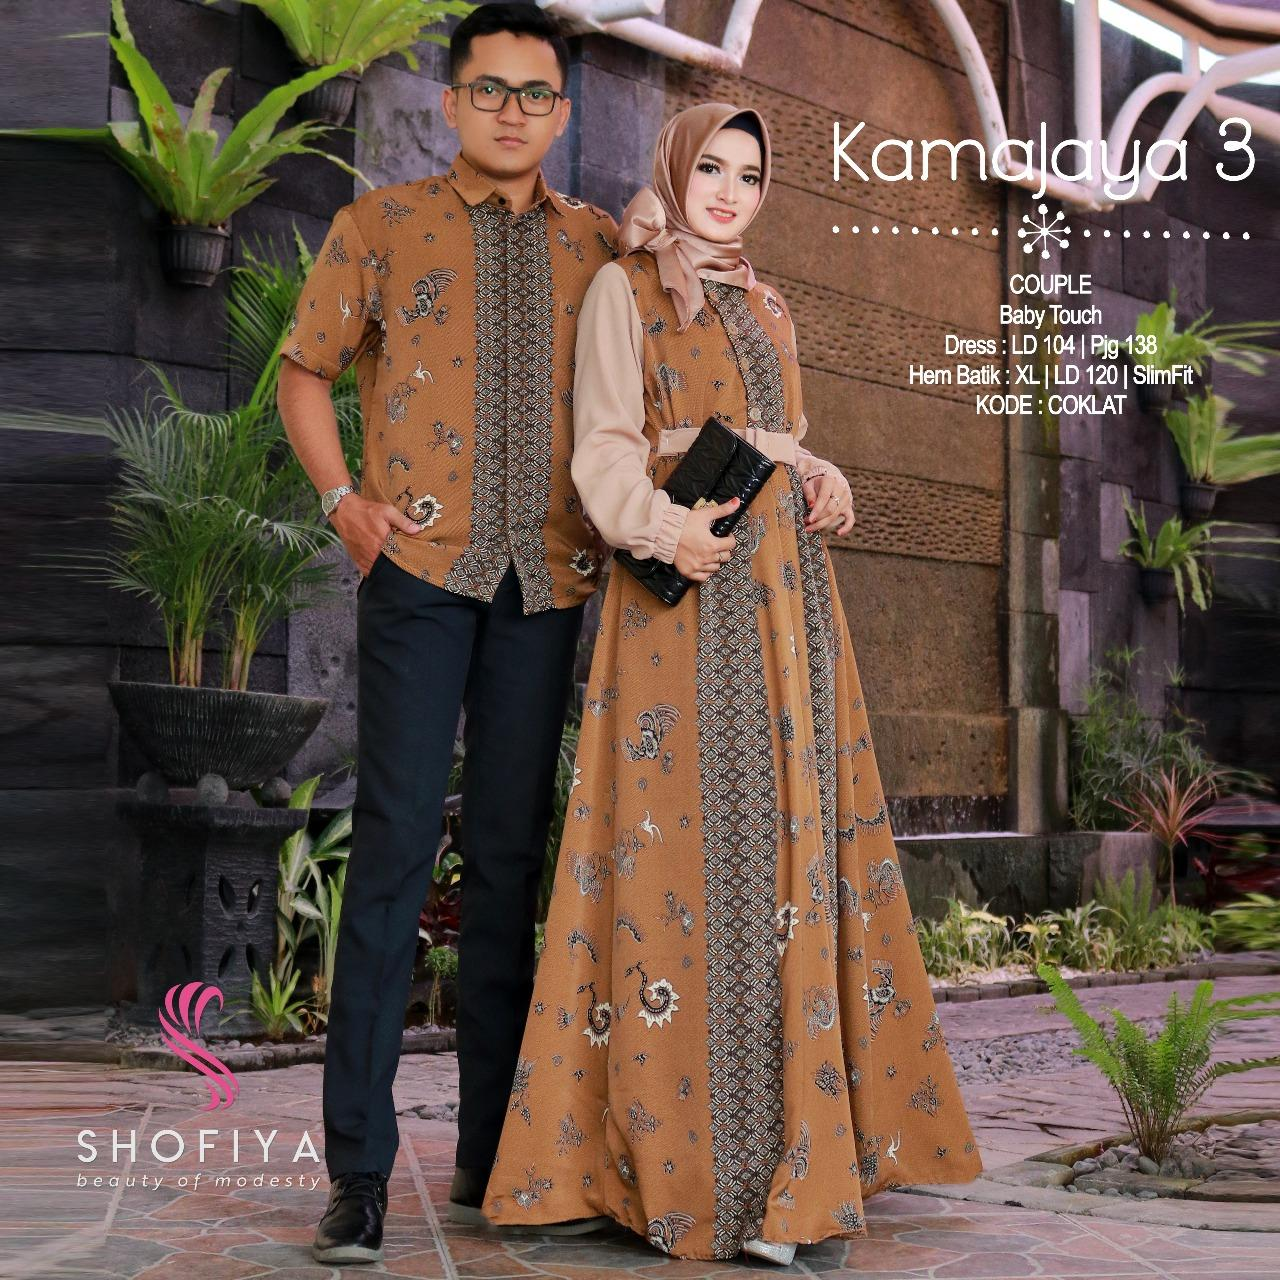 fc2d6e99a0ff6e83965936eca6cbde74 Koleksi Daftar Harga Batik Wanita Paling Bagus Paling Baru minggu ini